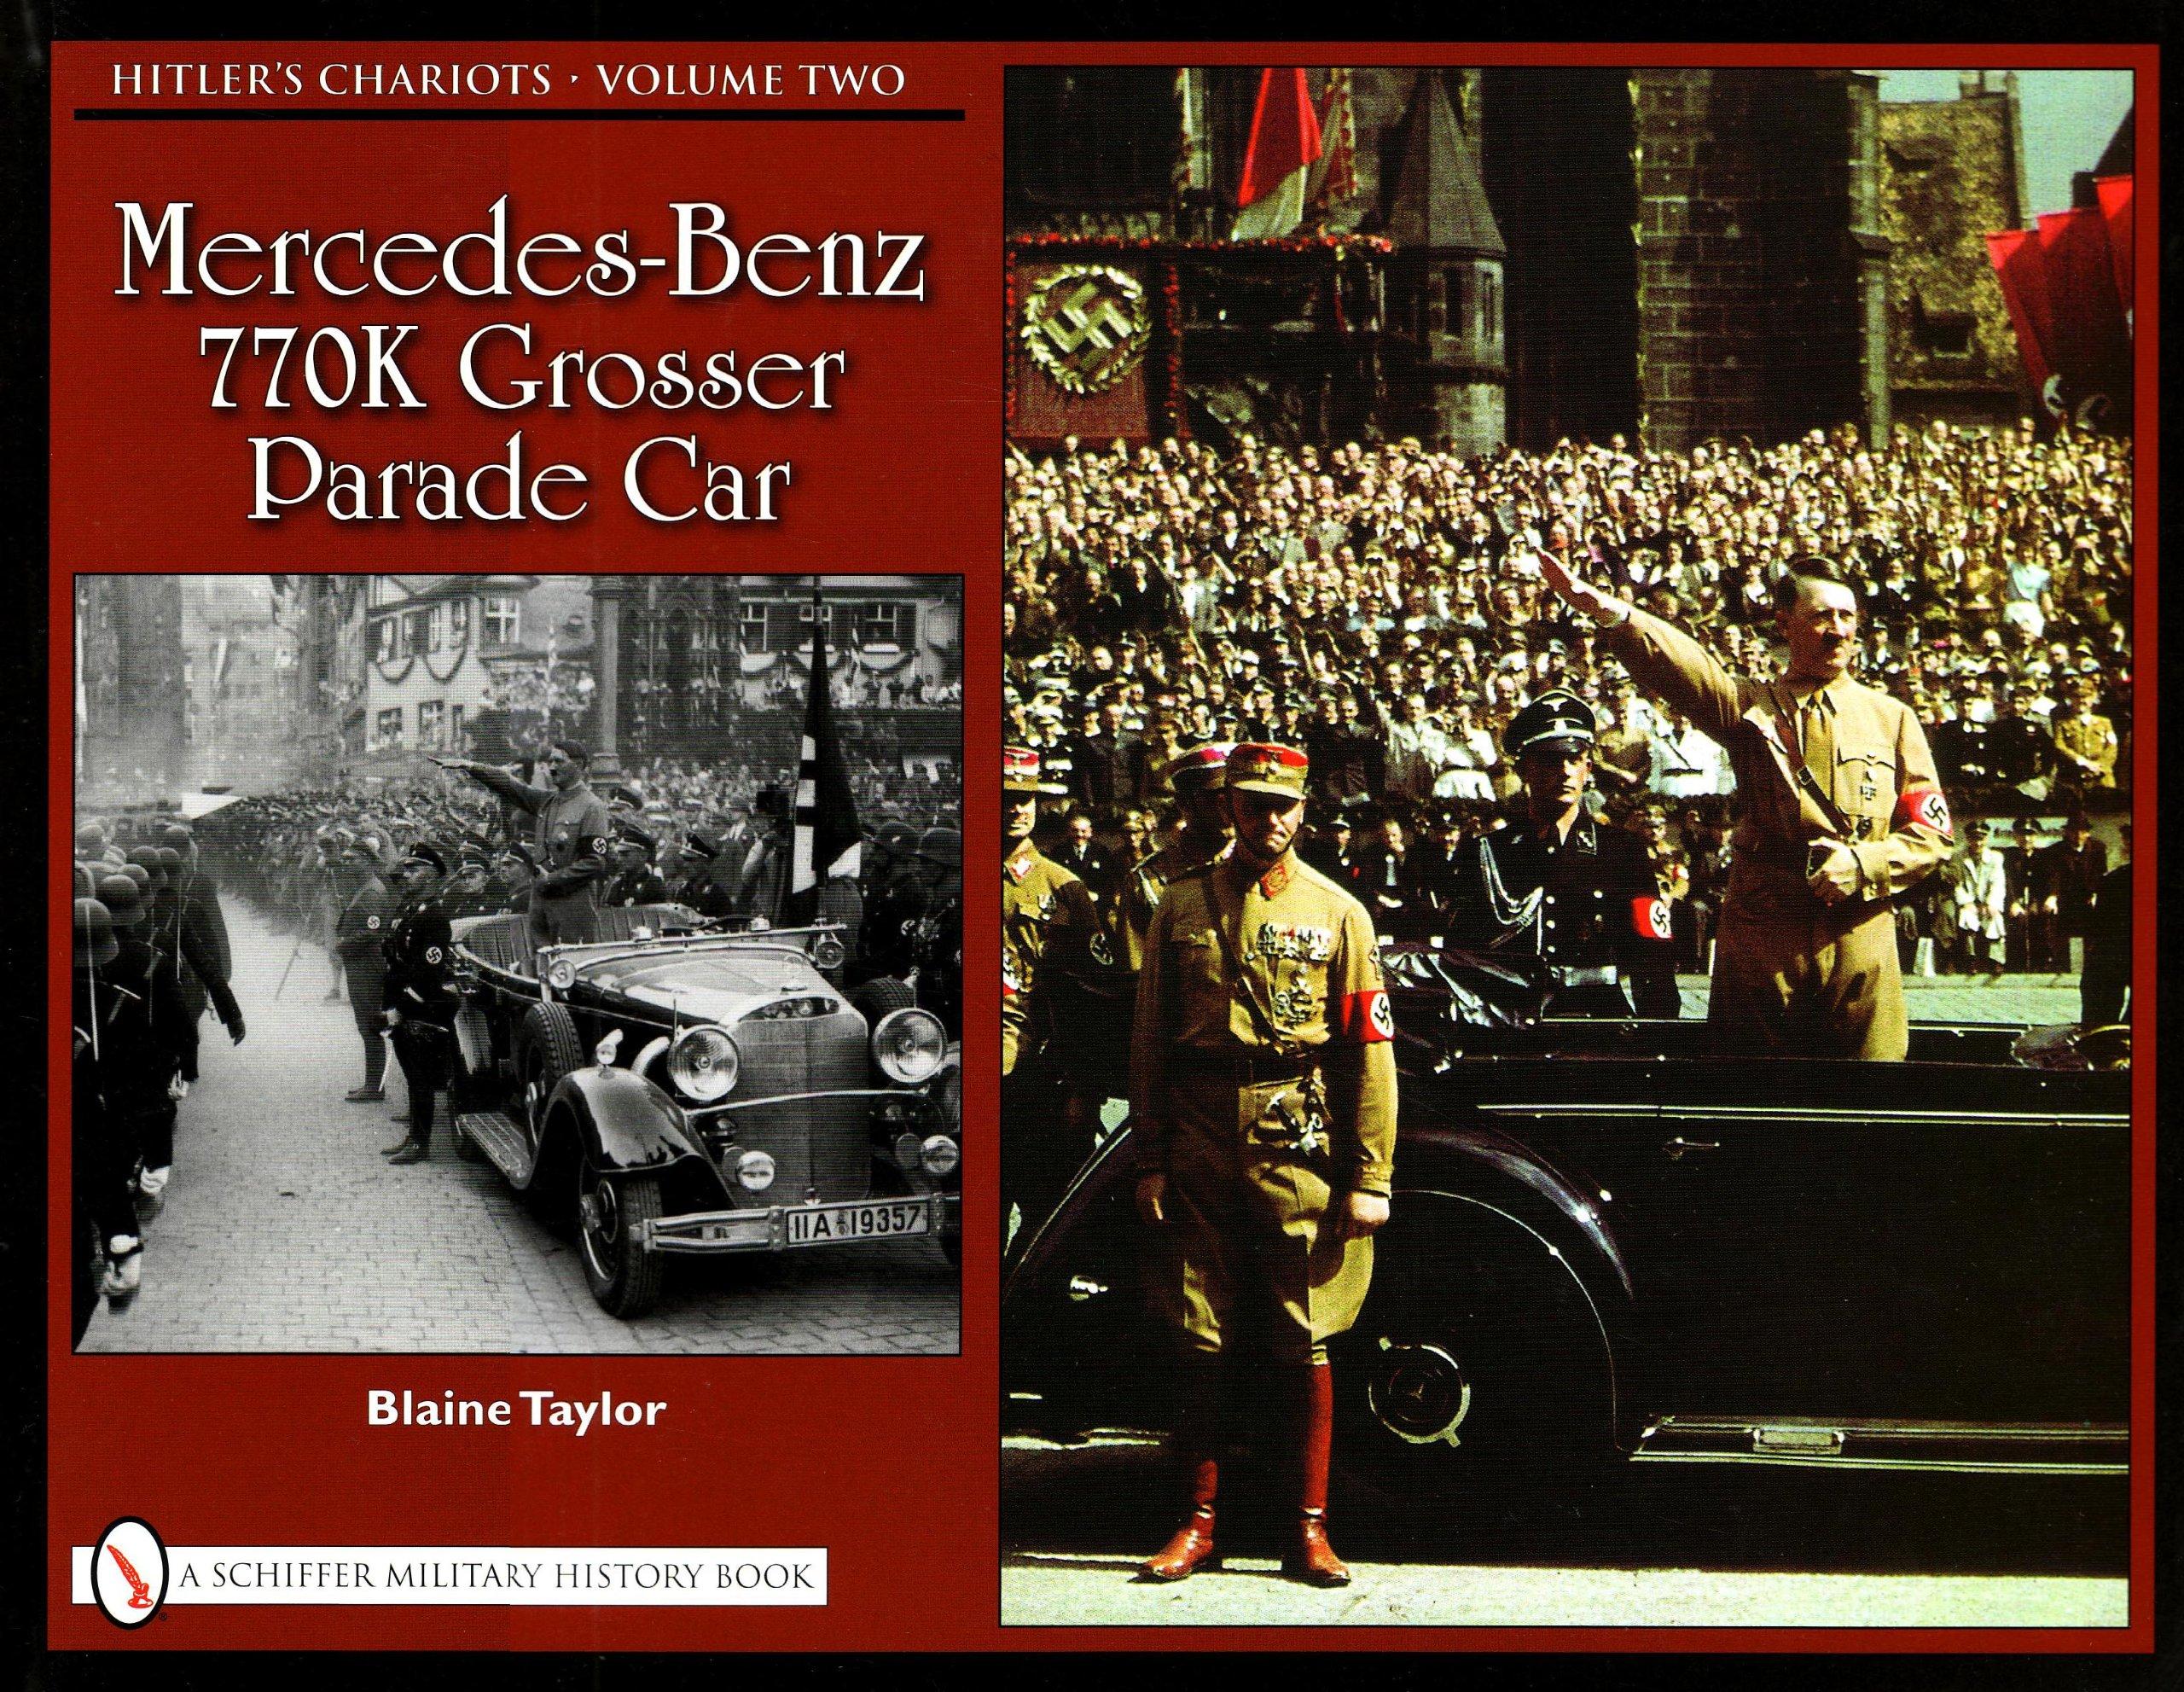 Hitlers Chariots  Volume Two:  Mercedes- Benz 770K Grosser Parade Car ebook